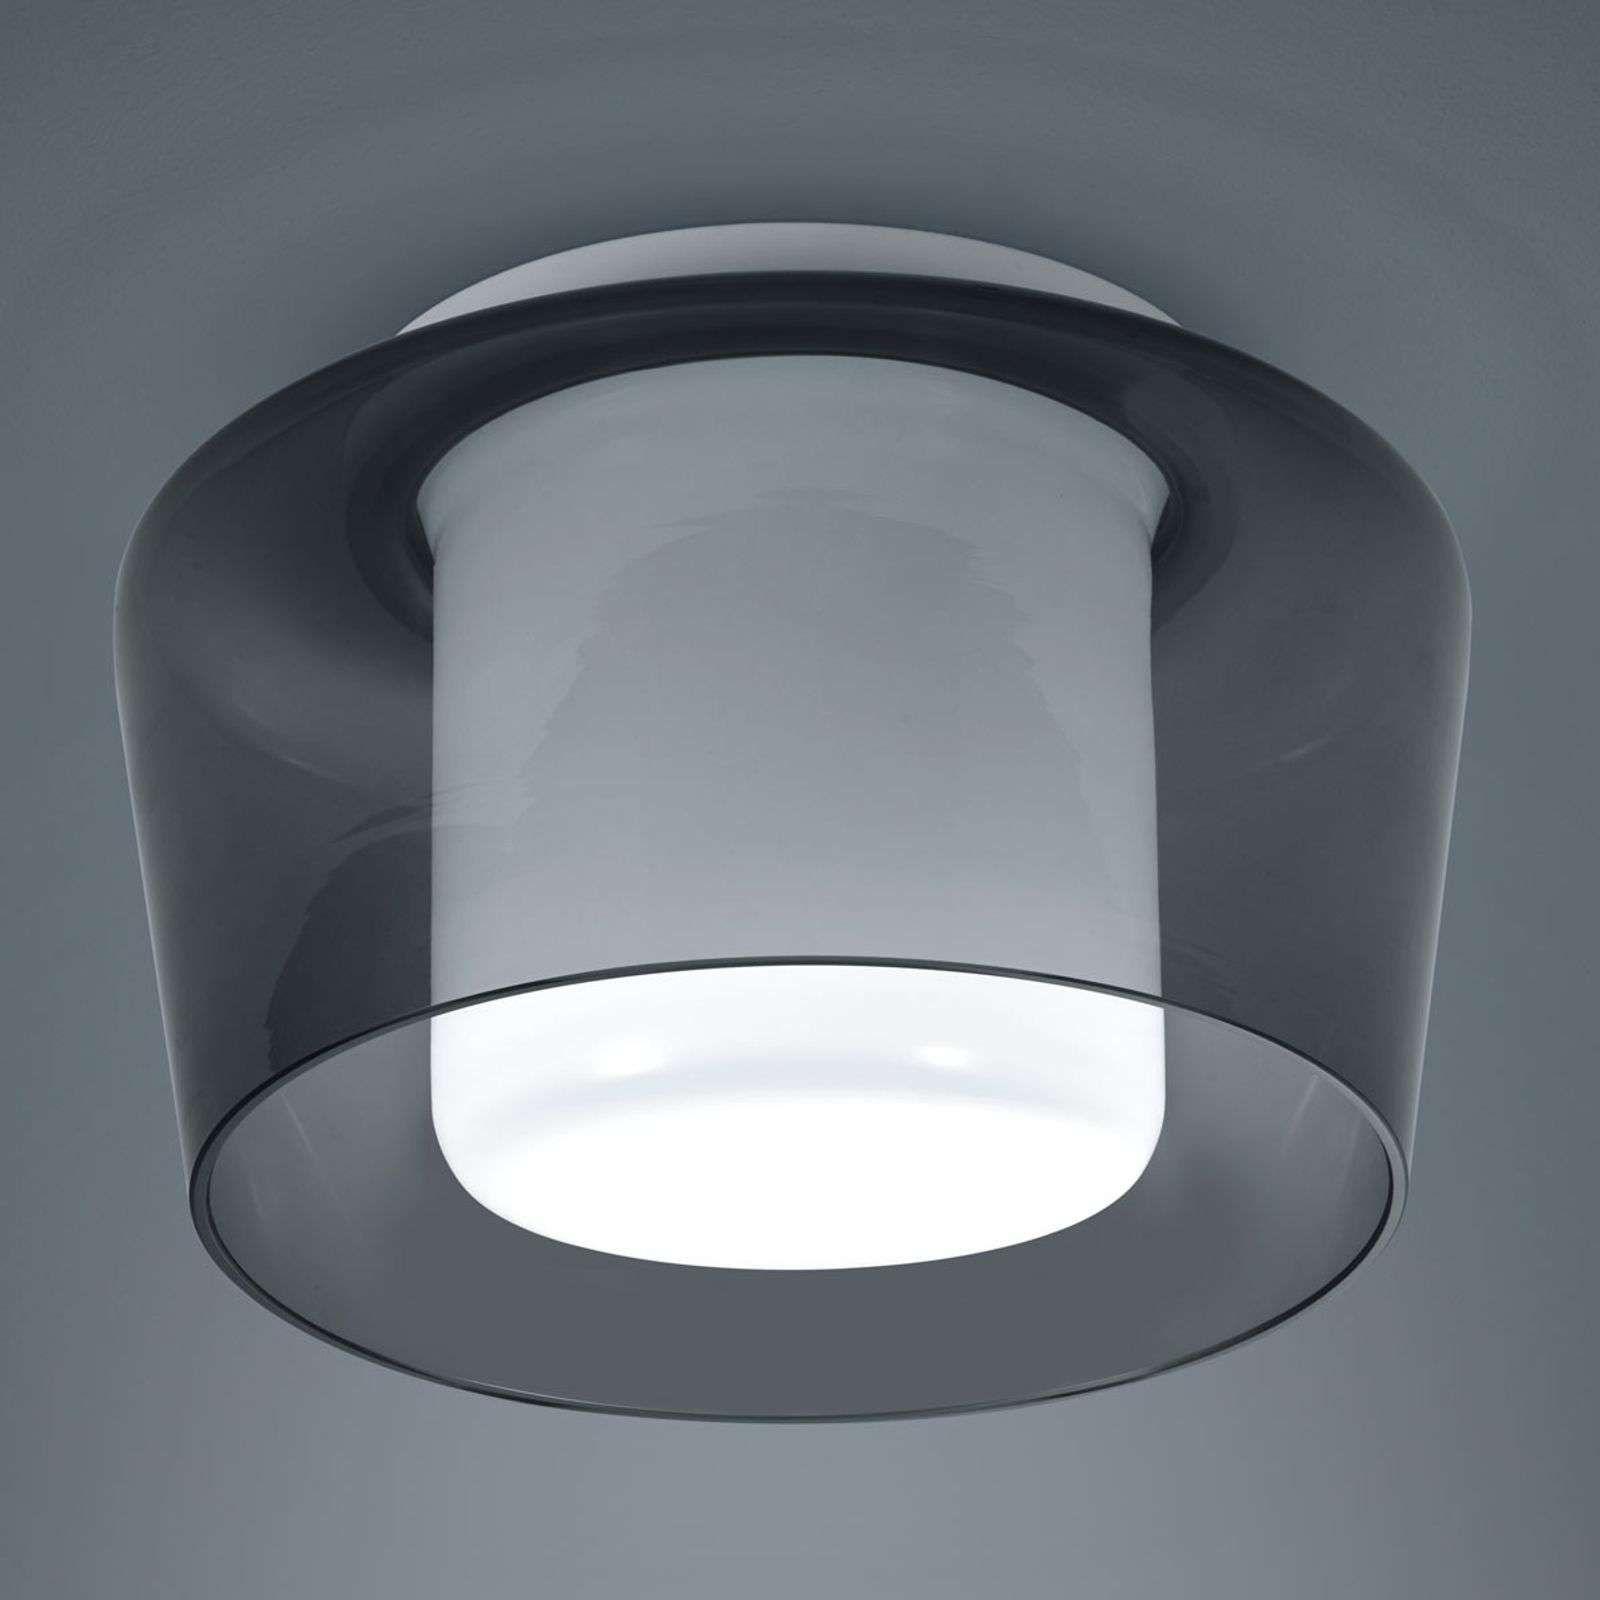 Helestra Canio Glazen Plafondlamp Rookgrijs Plafondlamp Plafondverlichting Koperen Lampen